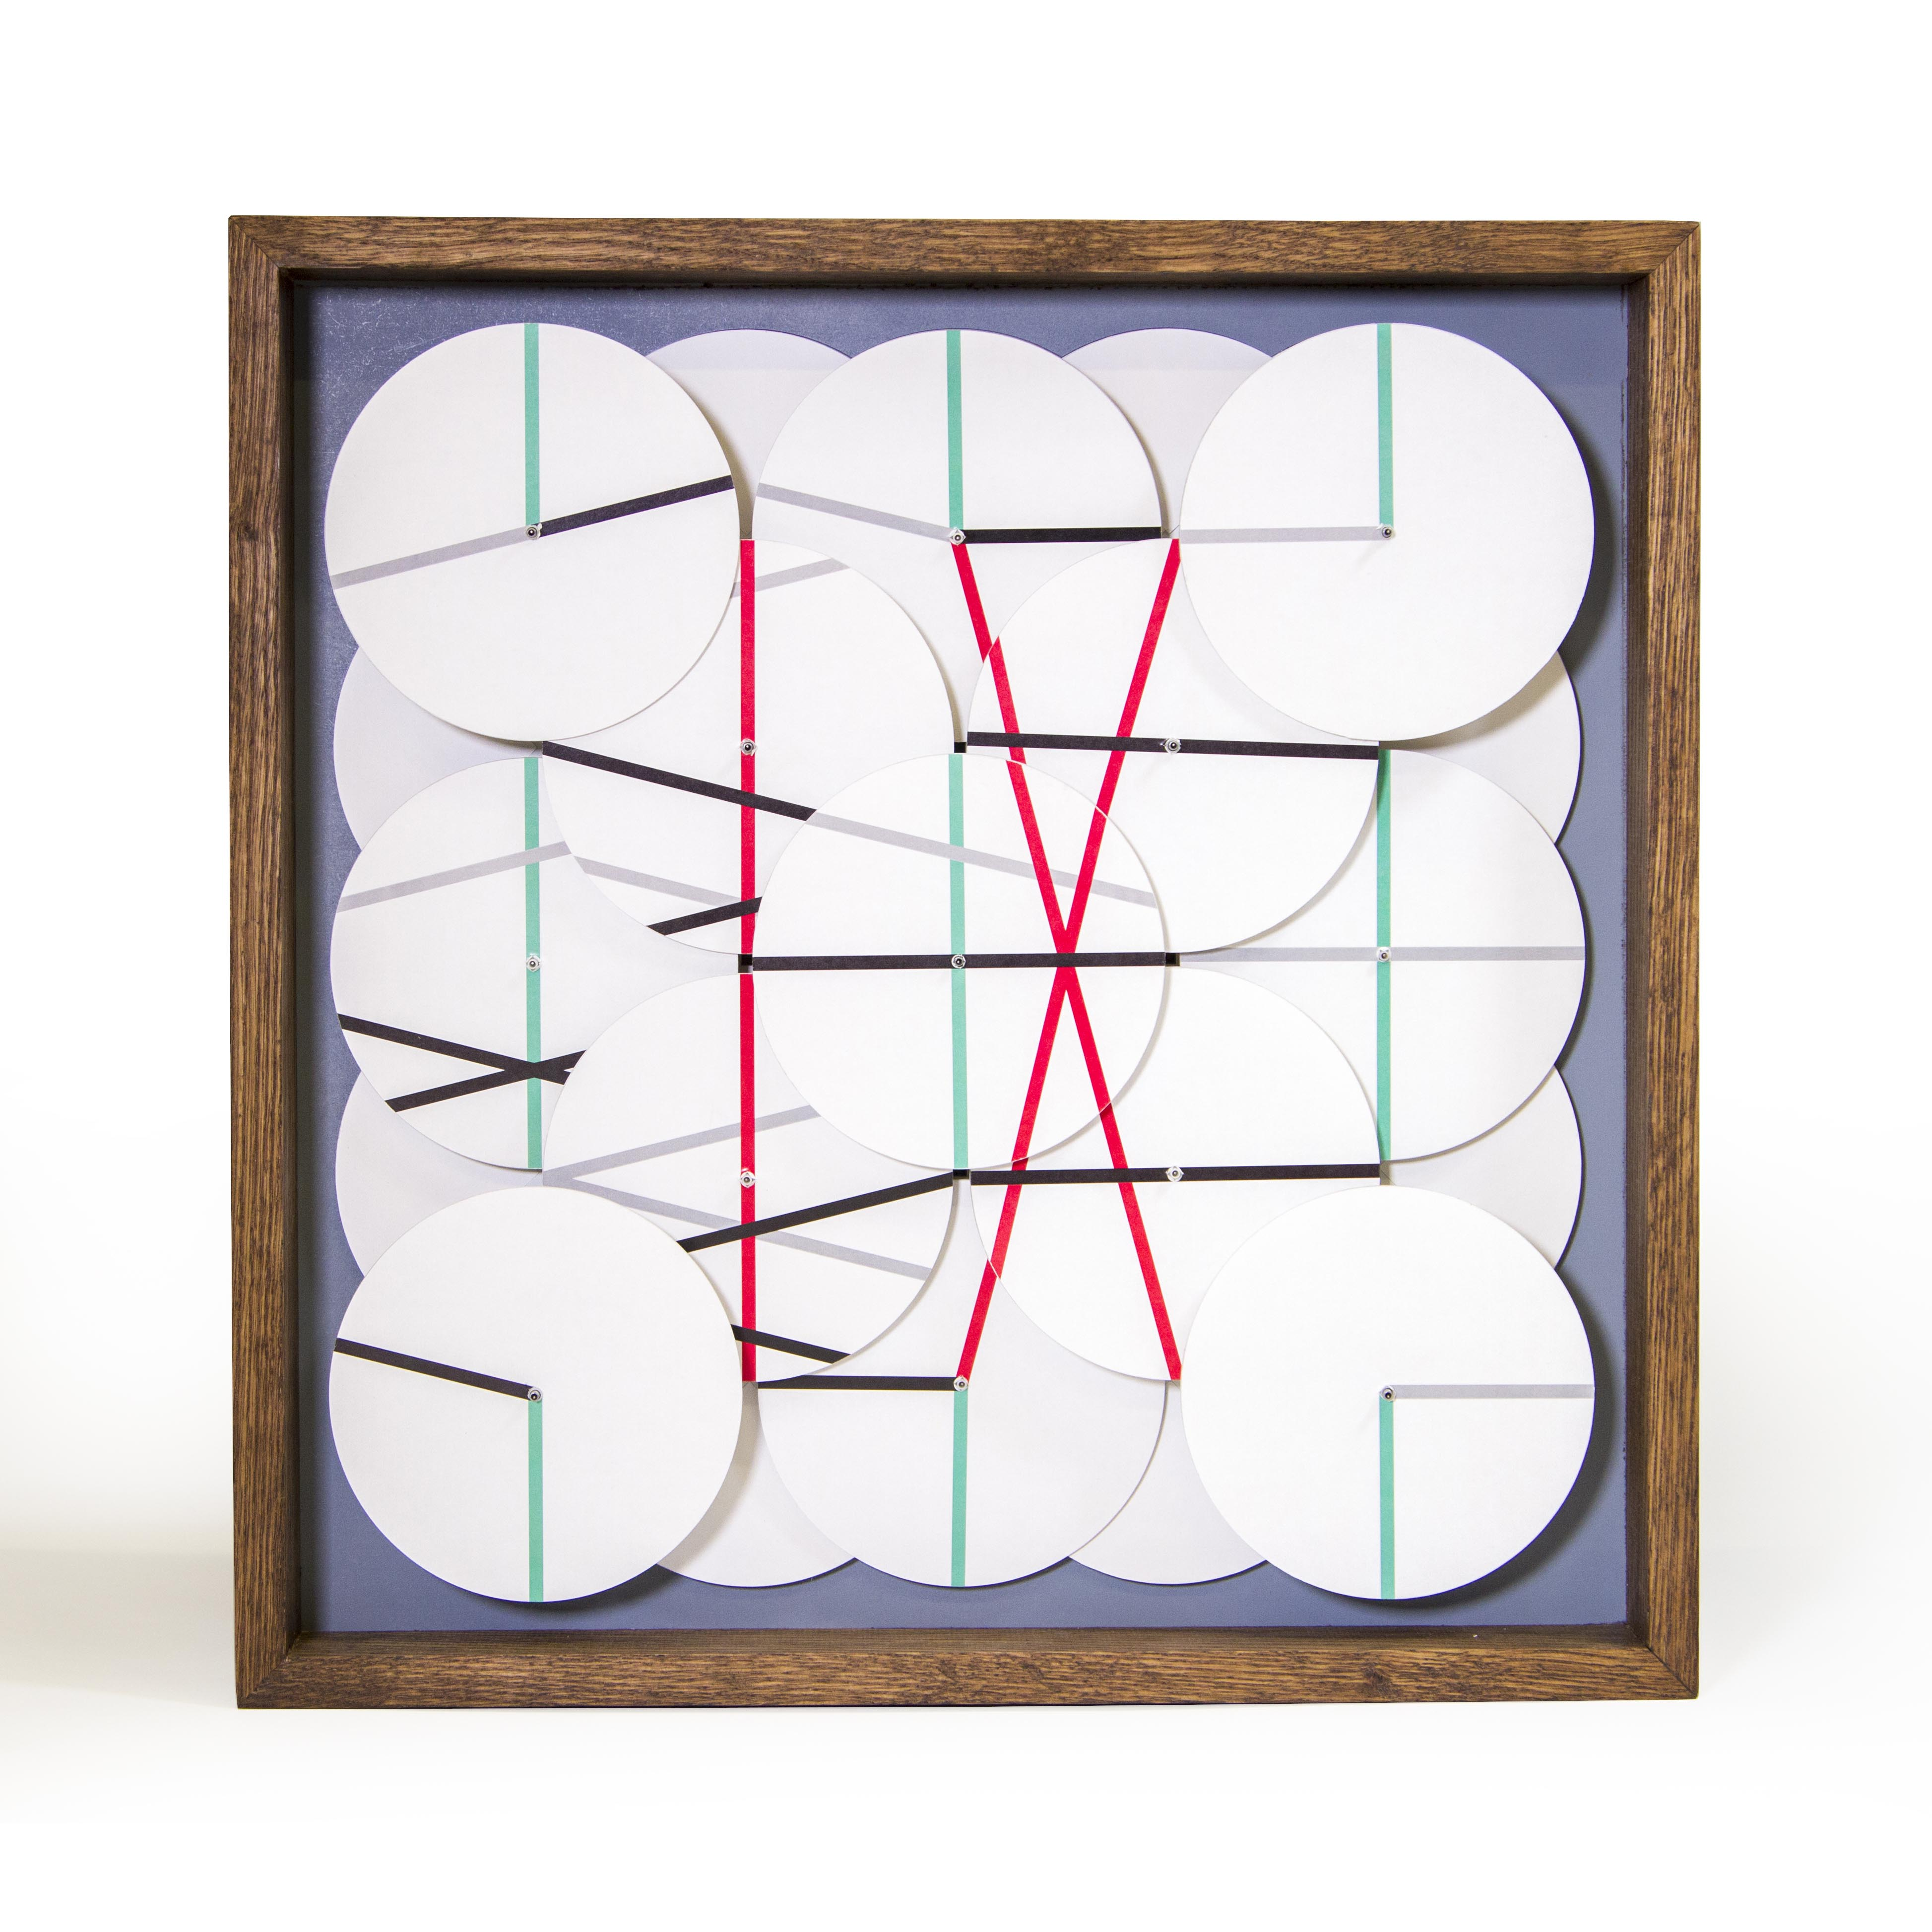 Axel Olson Roma Clock design